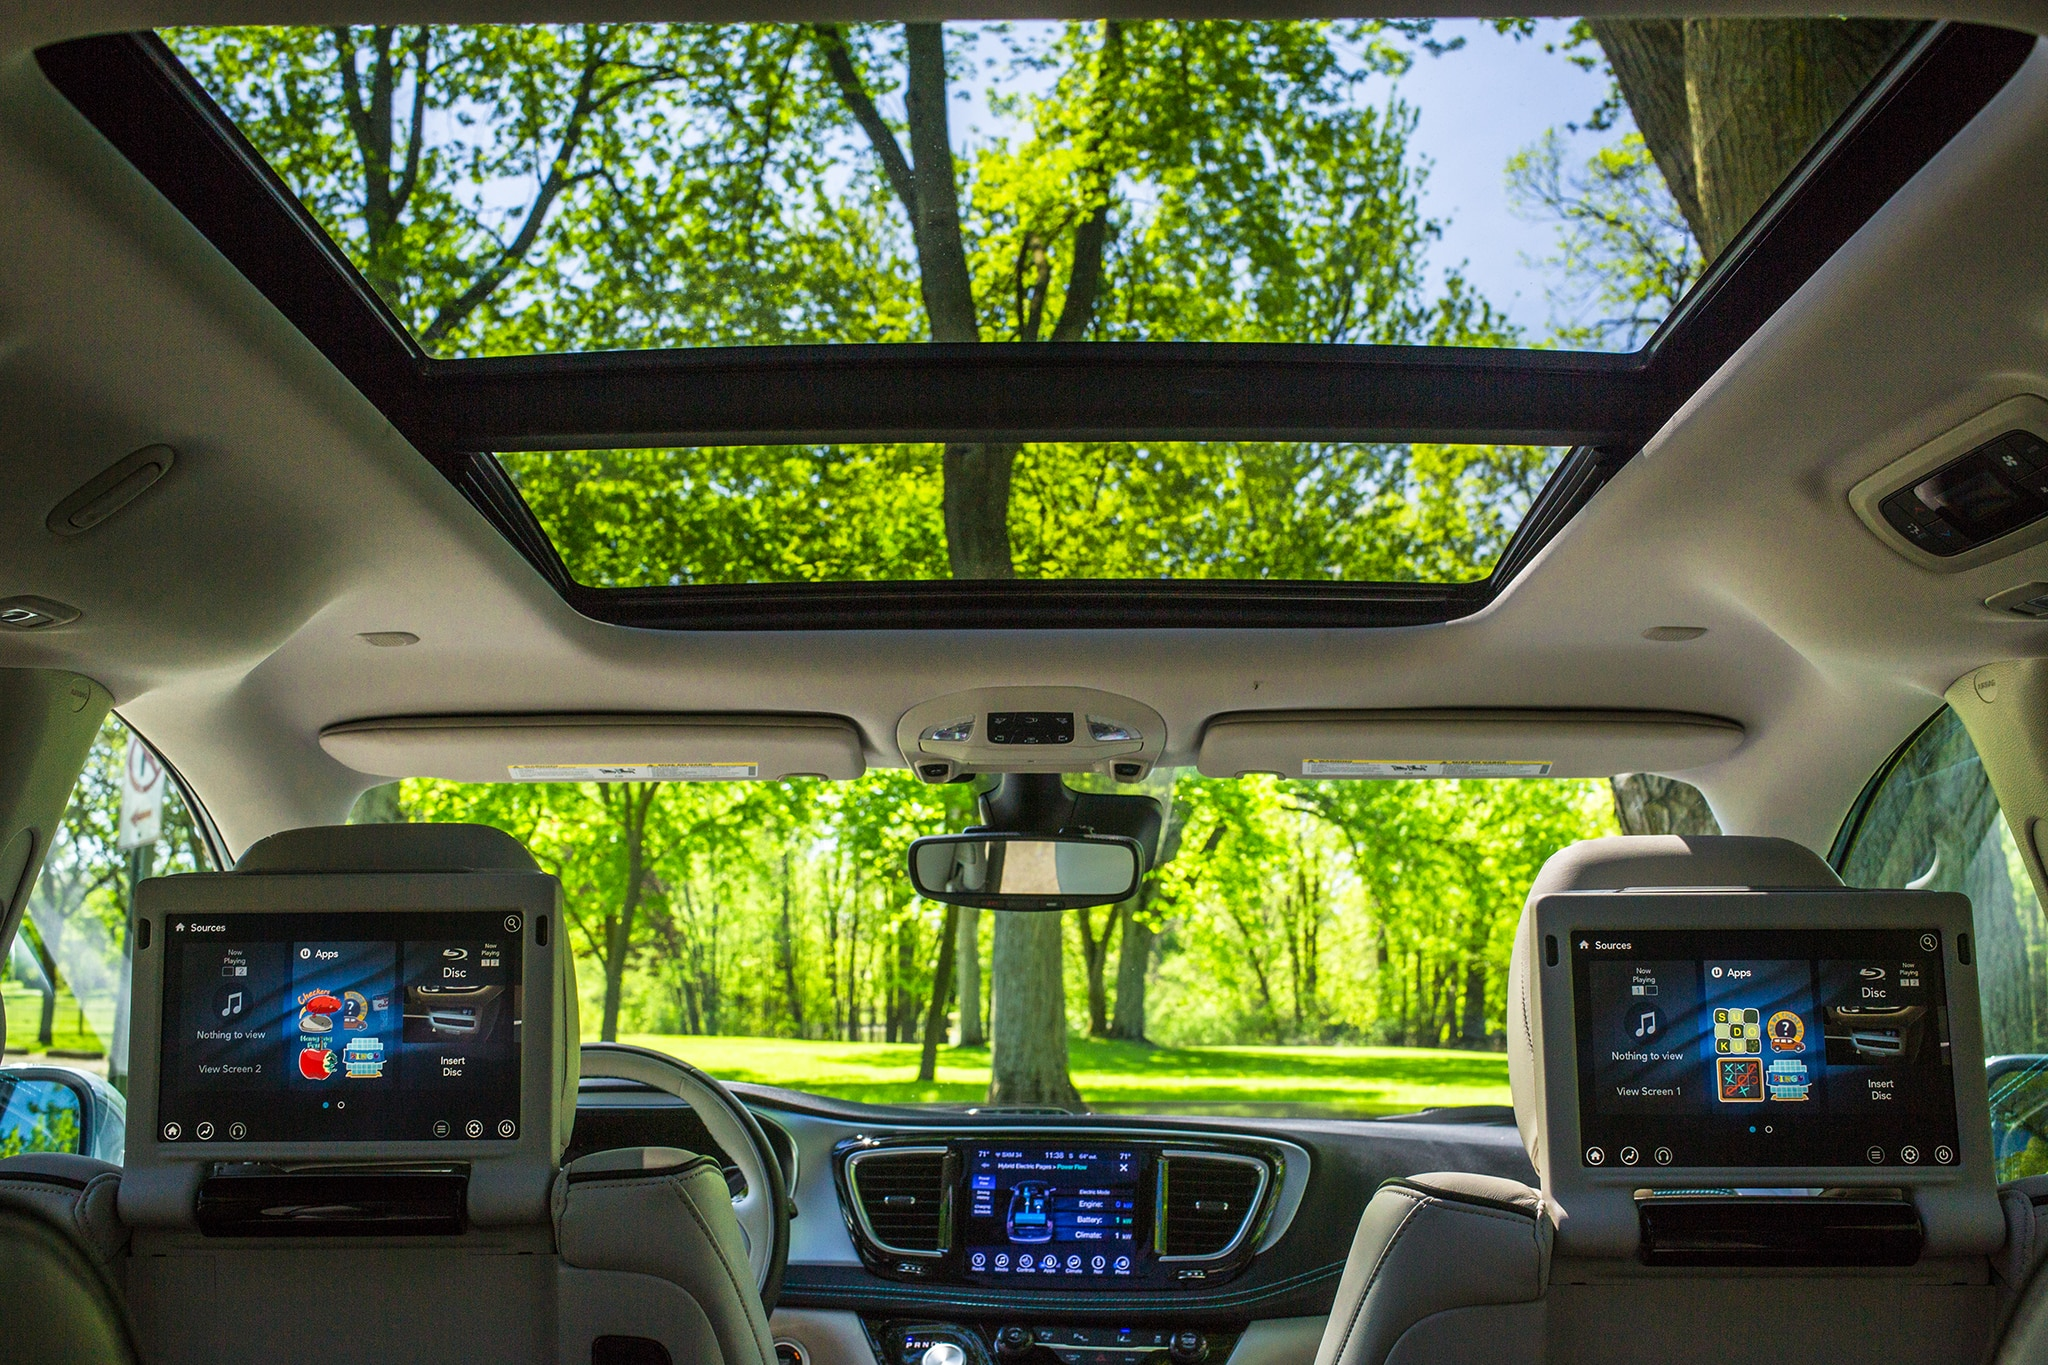 2017 chrysler pacifica hybrid platinum quick take review automobile magazine for Chrysler pacifica 2017 interior